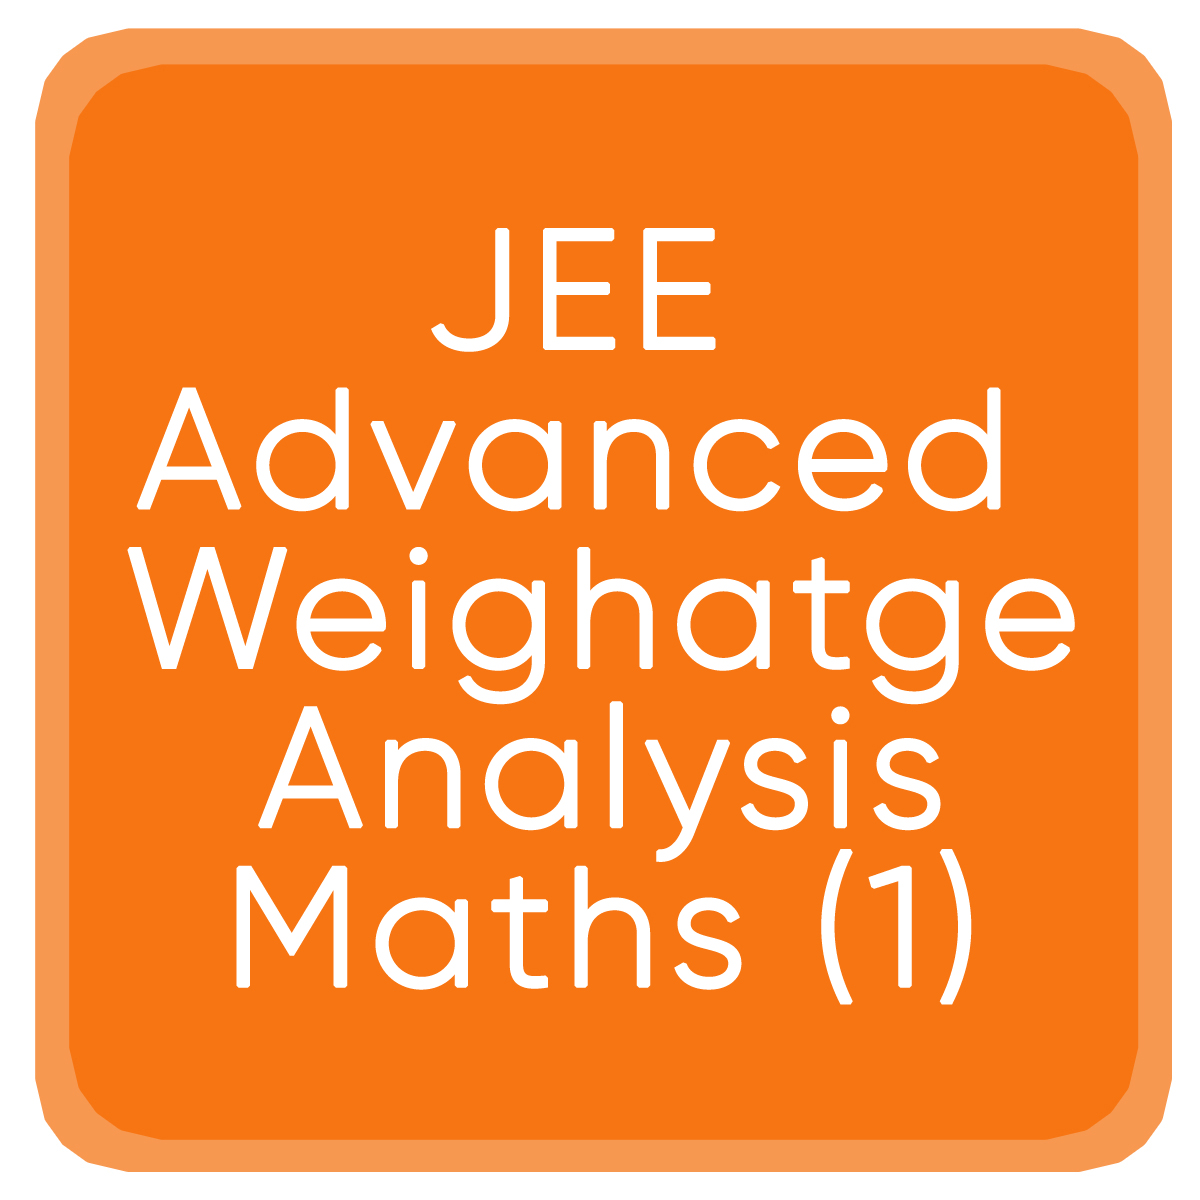 Jee Advanced Weighatge Analysis Maths (1)